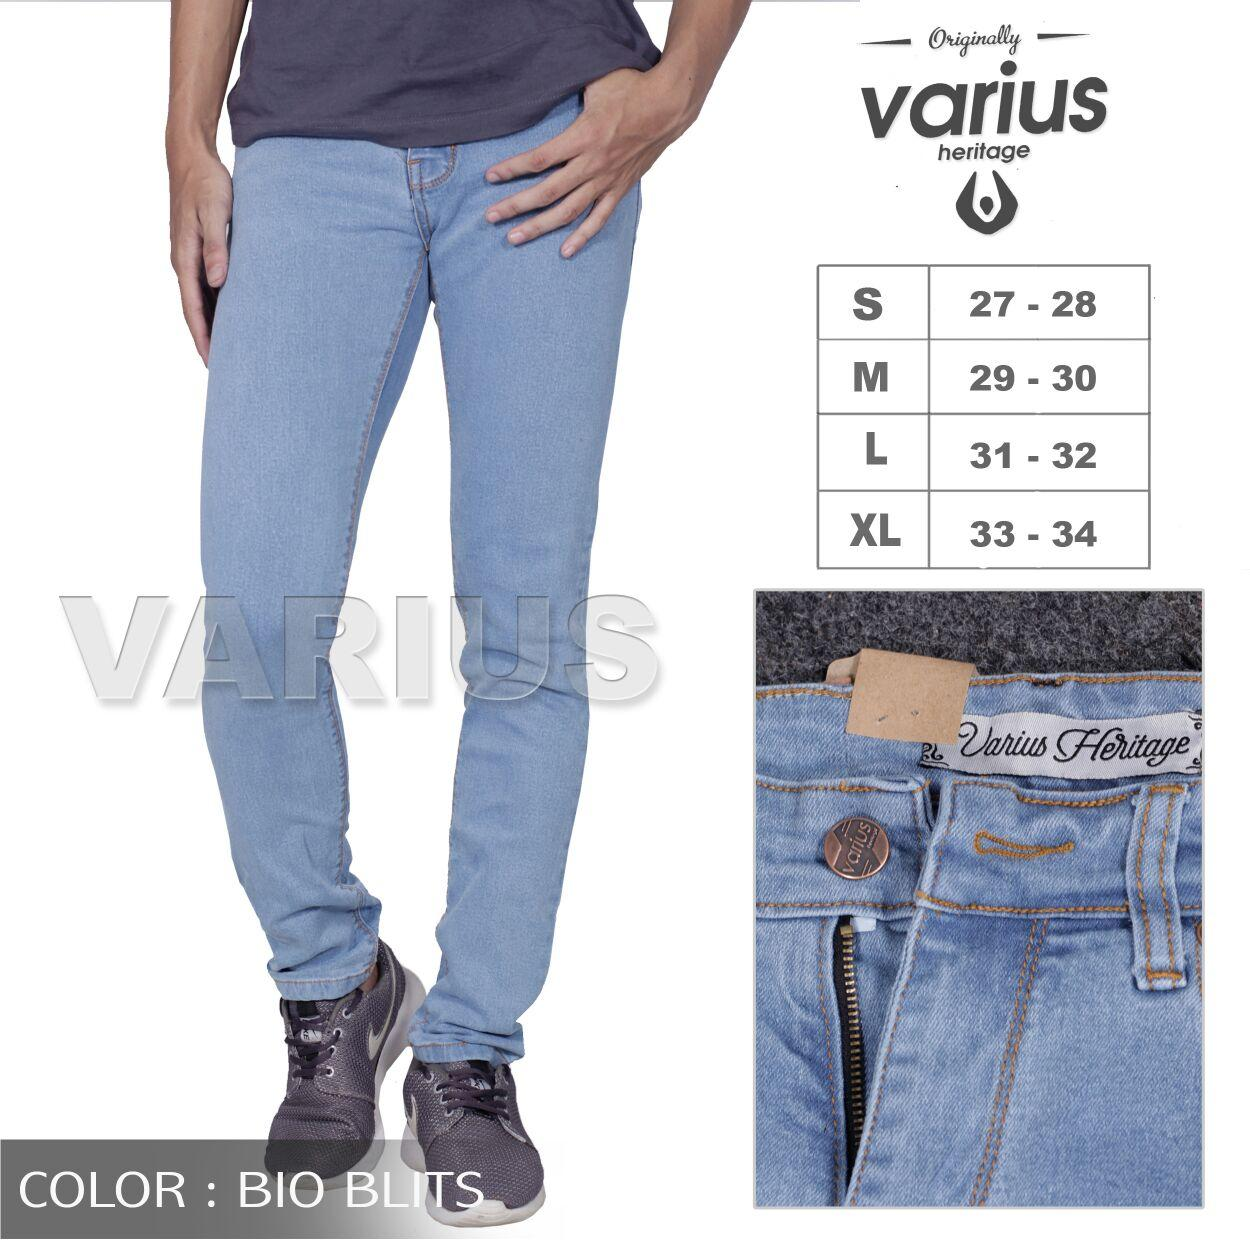 An Celana Jeans Panjang Pria Skinny Hight Quality Blue Wosh Daftar Lois Original Sskt081 Navy 33 Bioblits Levis